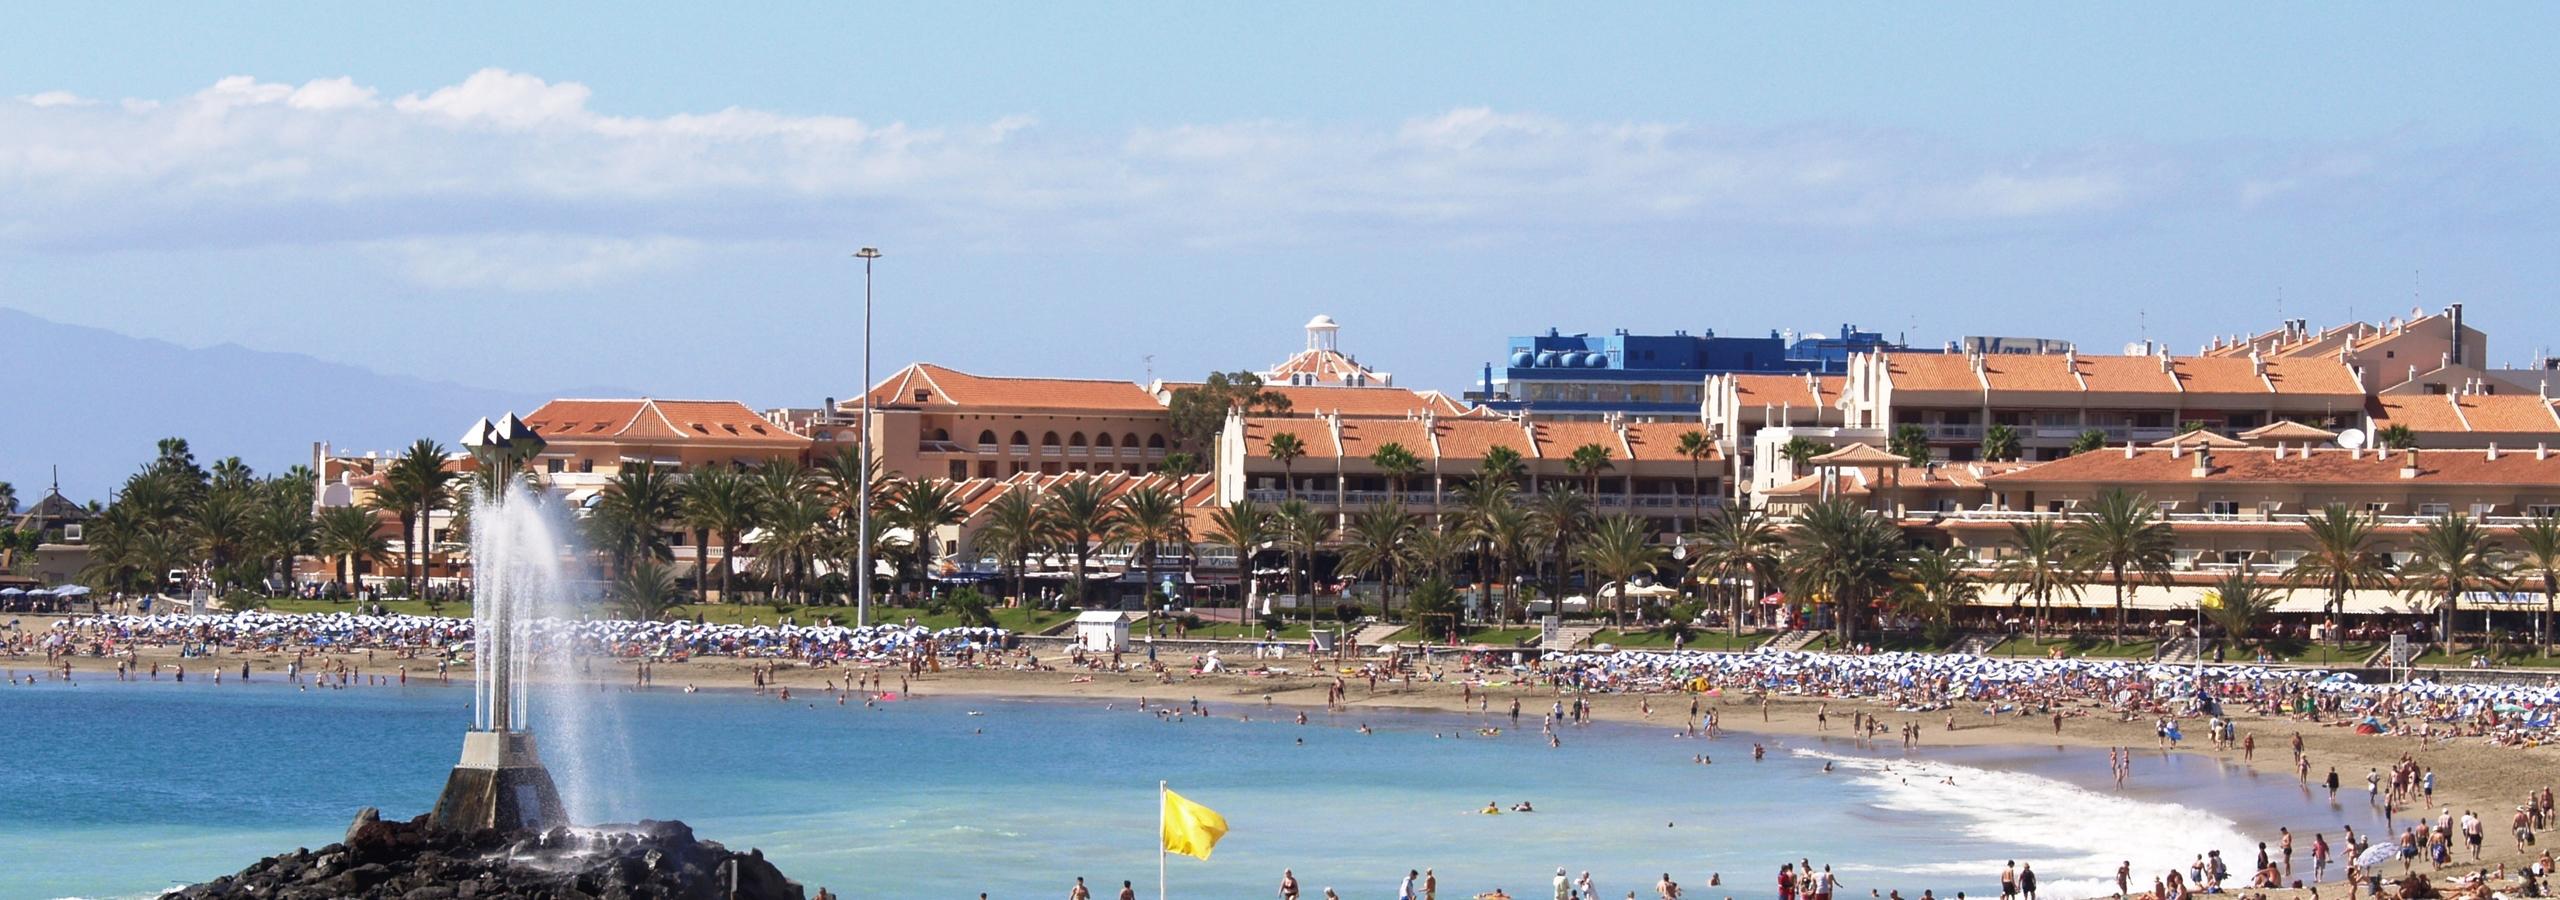 Las Vistas Beach Feb 08 88